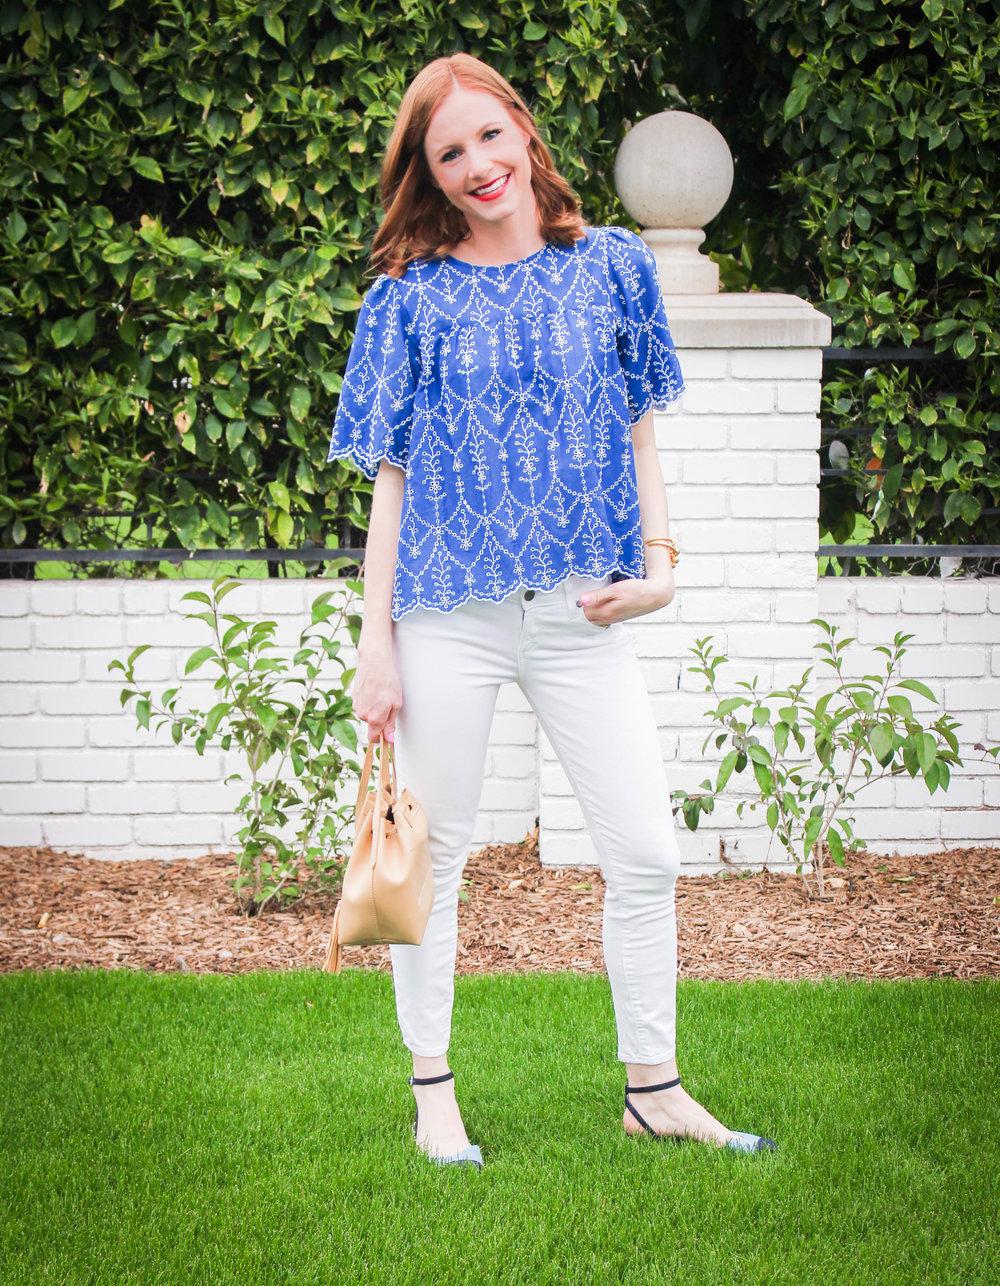 woman posing in blue top